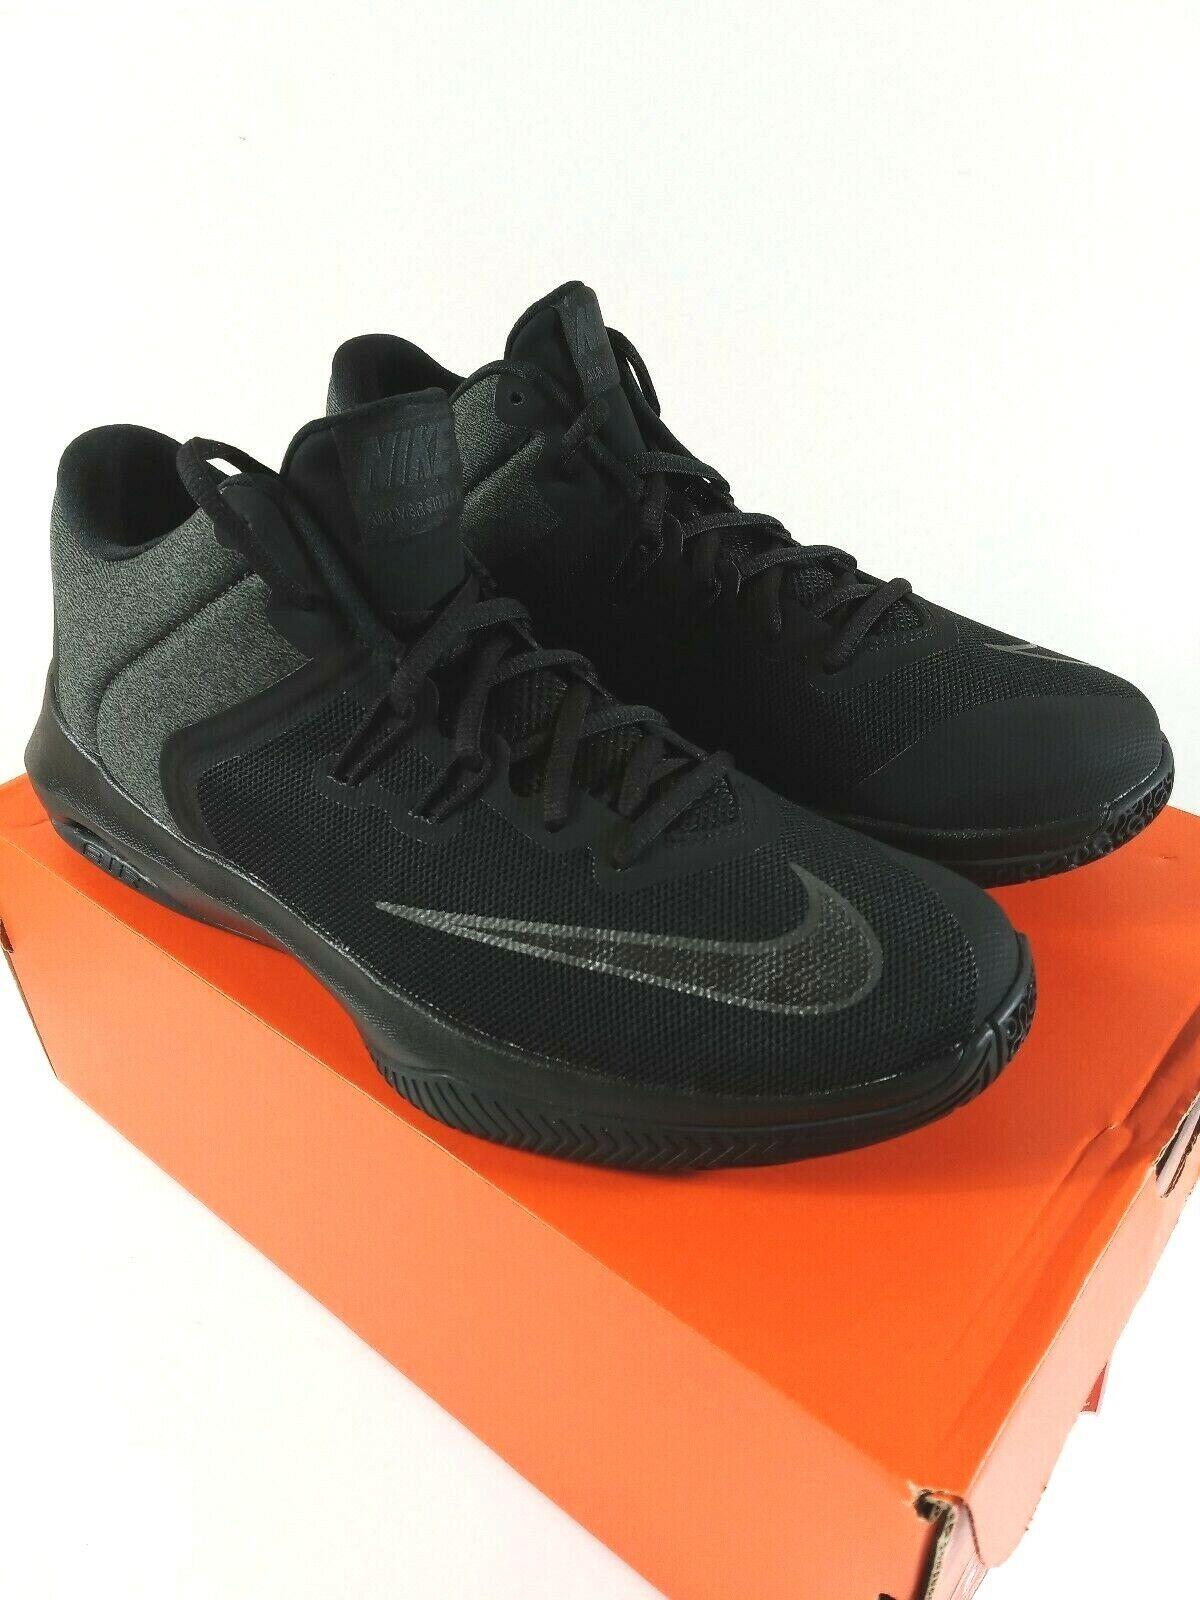 NIKE AIR VERSITILE II NBK Basketball shoes Mens Size 9 BLACK AA3819-002